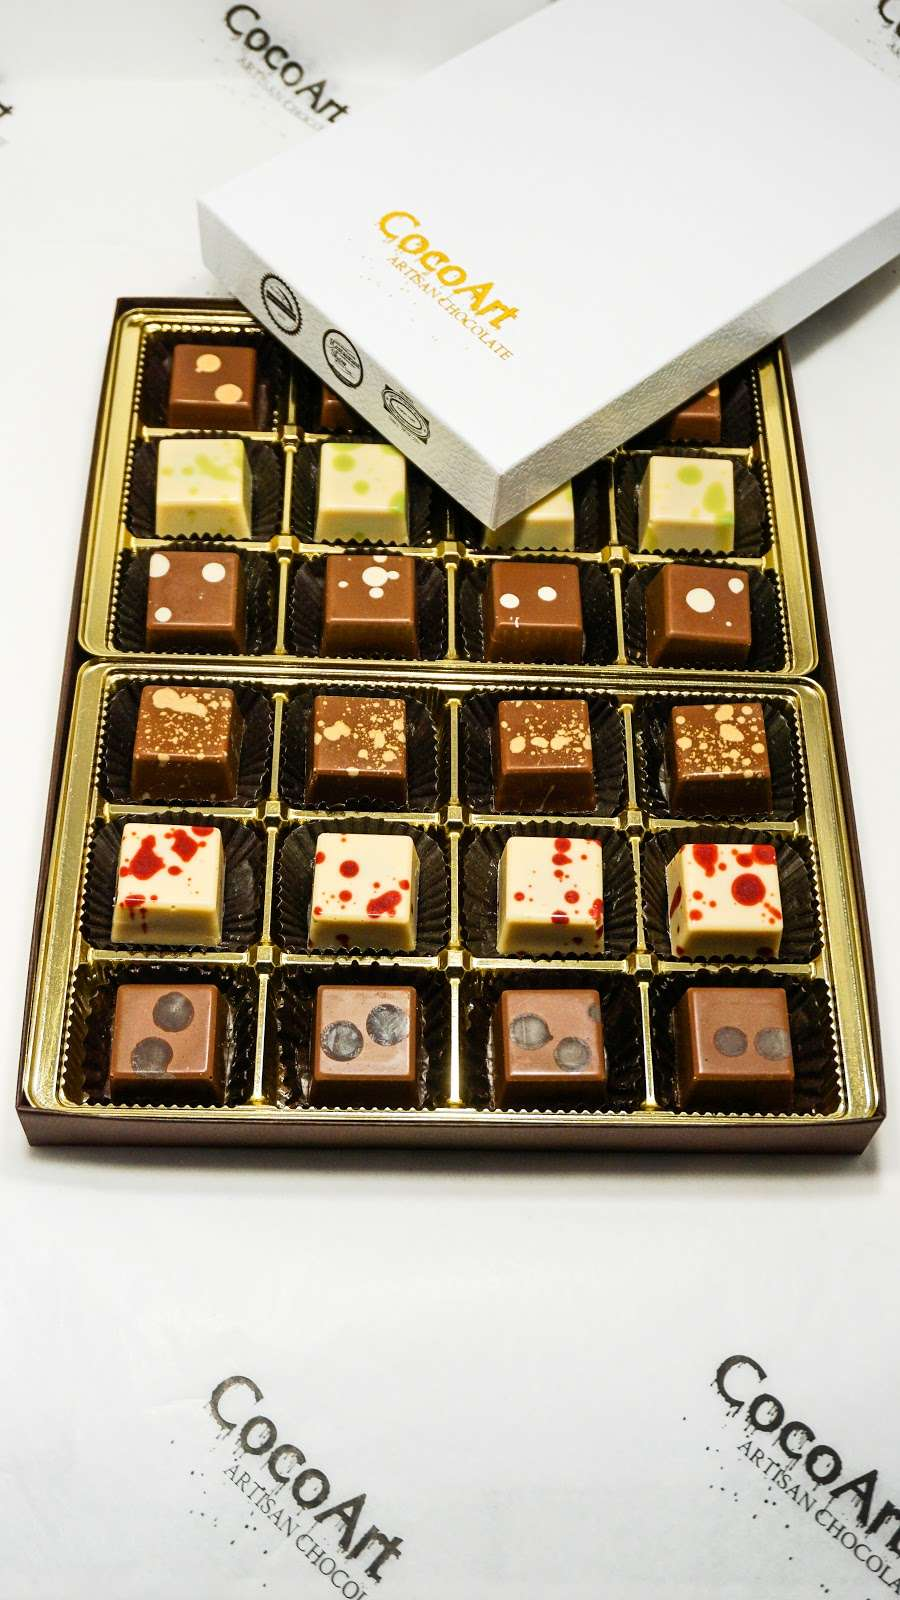 CocoArt Chocolate - store    Photo 5 of 10   Address: 20 Prag Blvd #002, Monroe, NY 10950, USA   Phone: (845) 248-1617